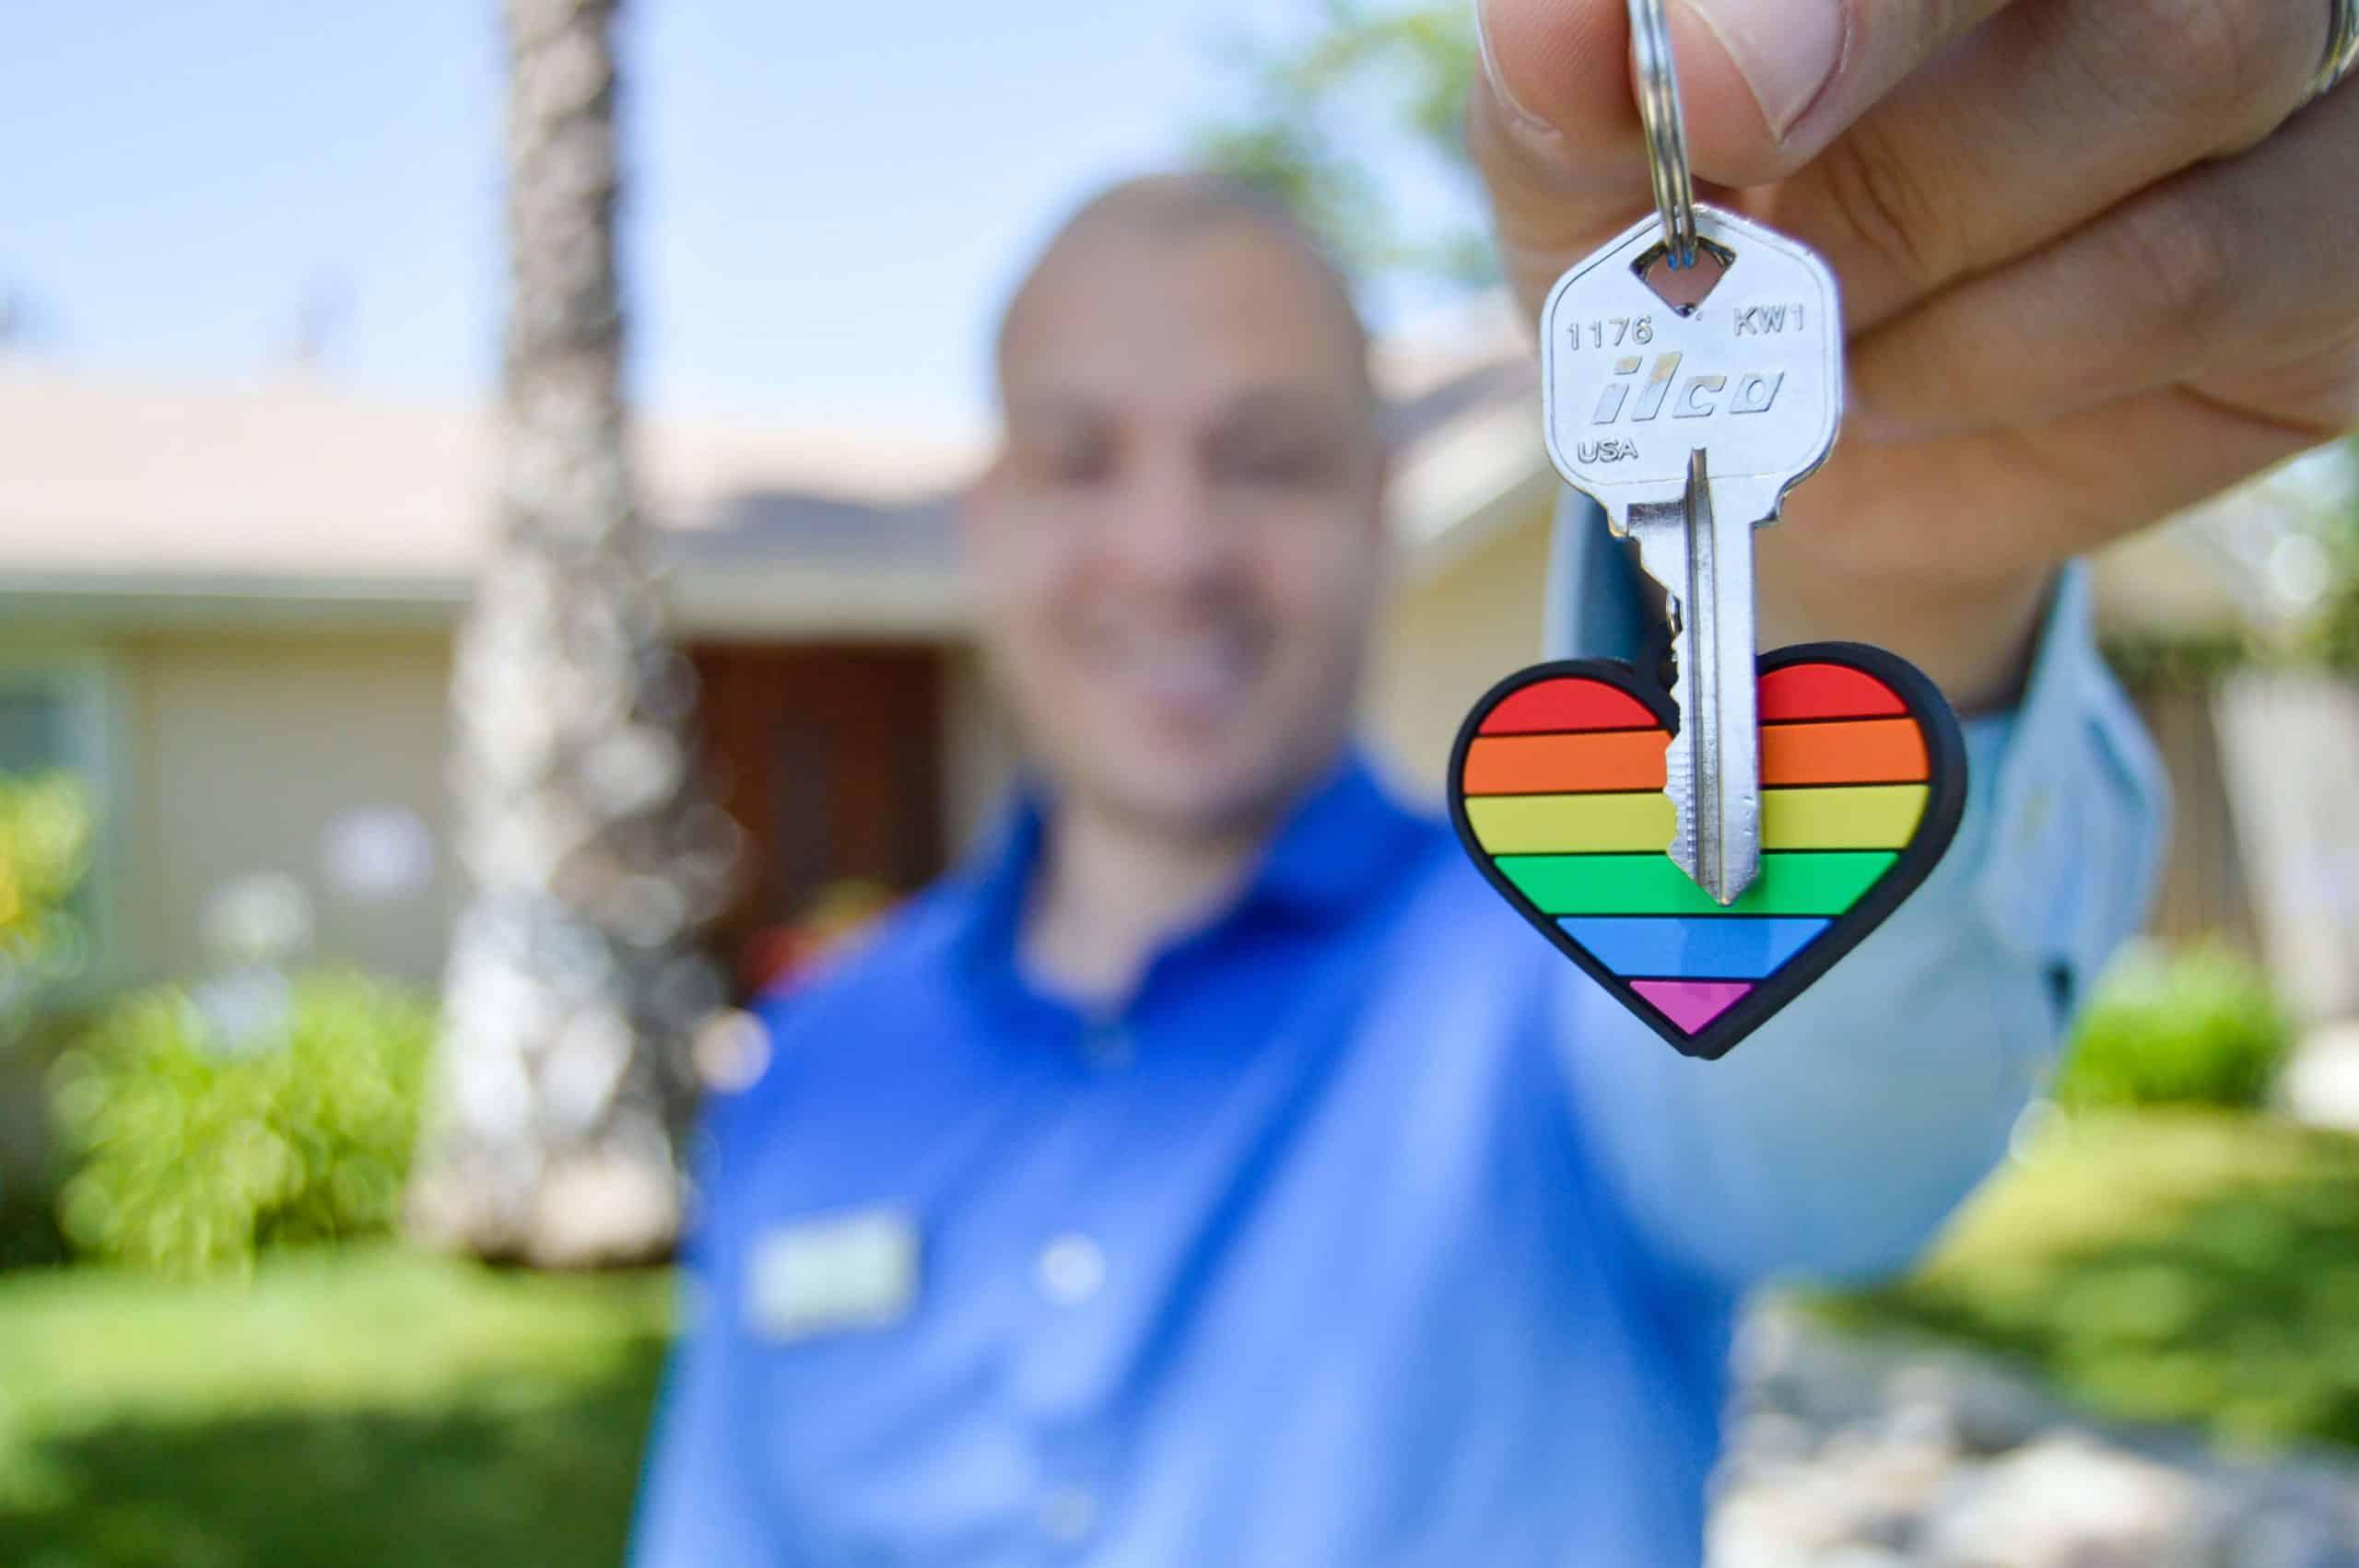 Selective photo of gray key with heart key chain